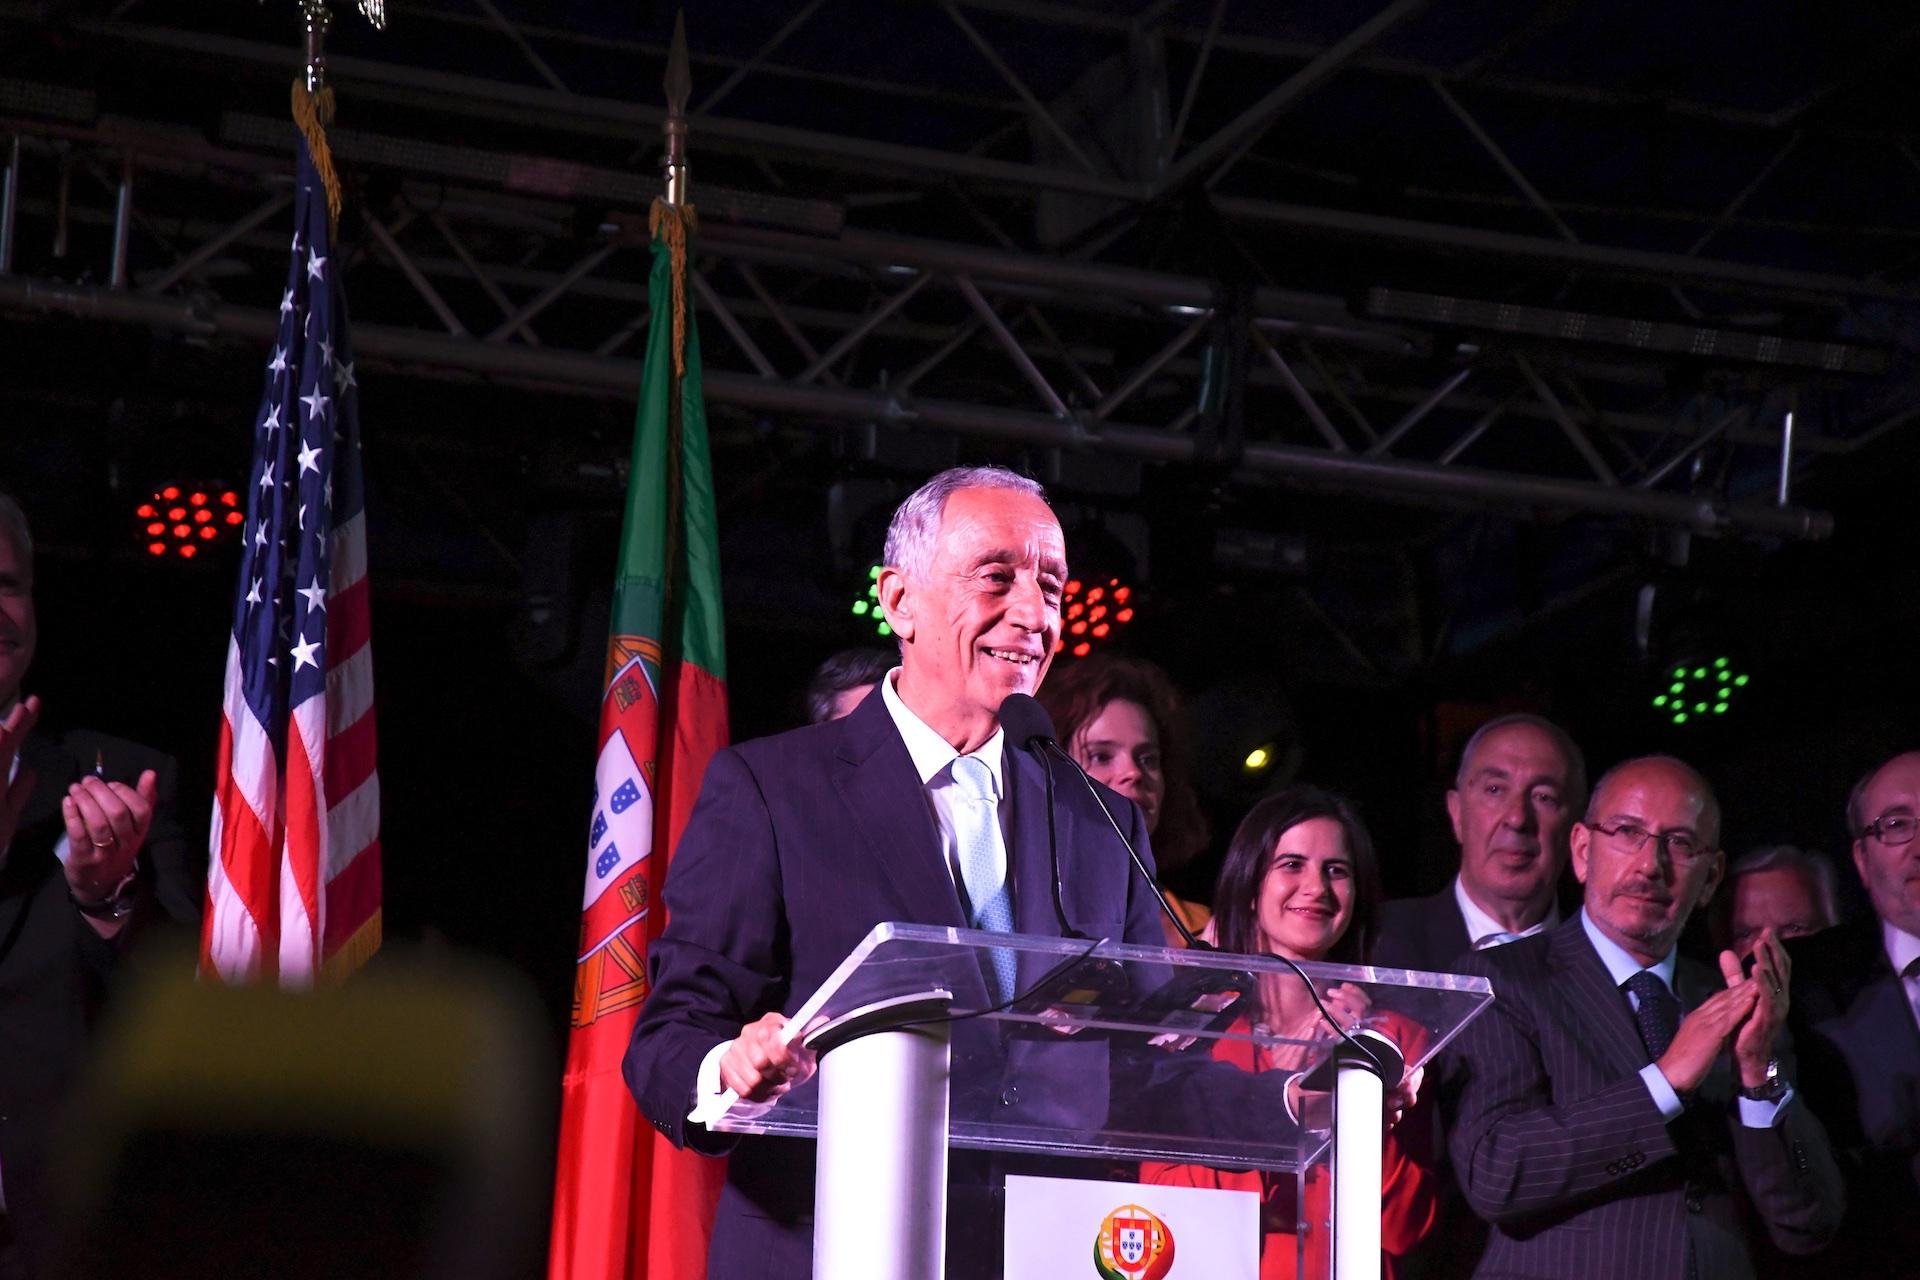 portuguese-president-marcelo-rebelo-de-sousa-addresses-the-crowd-in-the-alex-and-ani-city-center_279